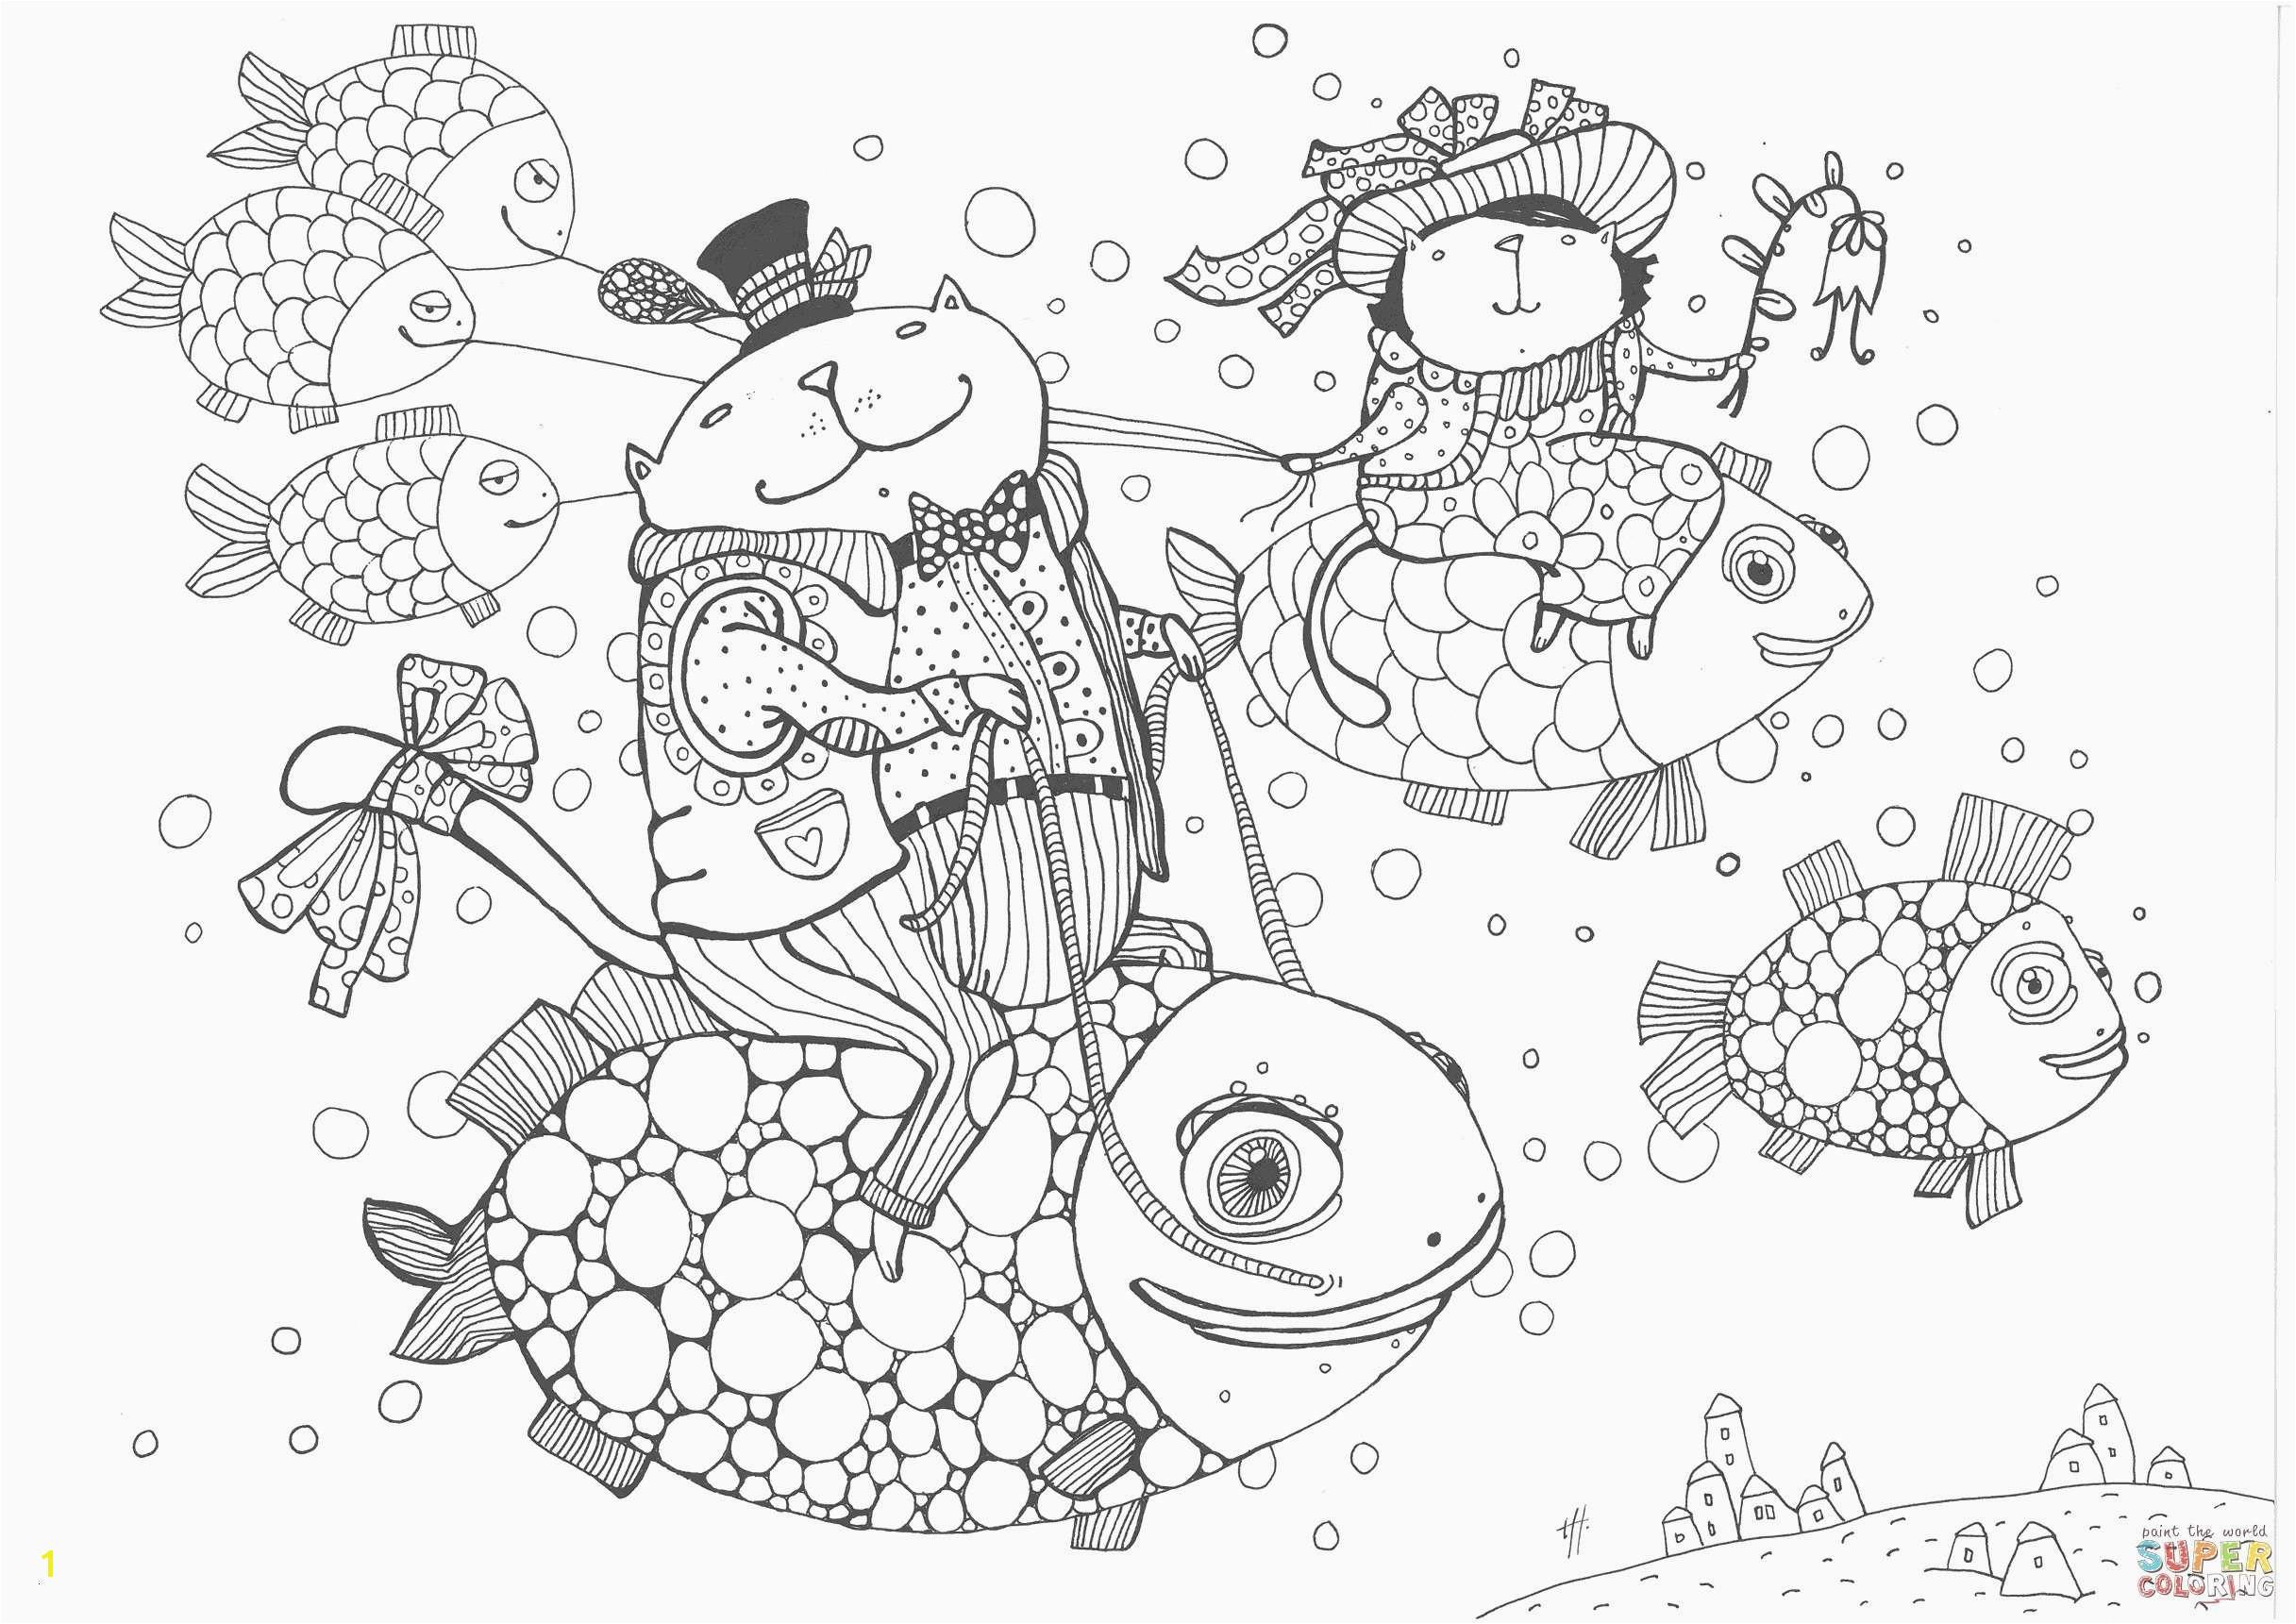 Santa Claus Coloring Pages Santa Claus Coloring Pages Santa Claus with Christmas Tree Coloring Pages